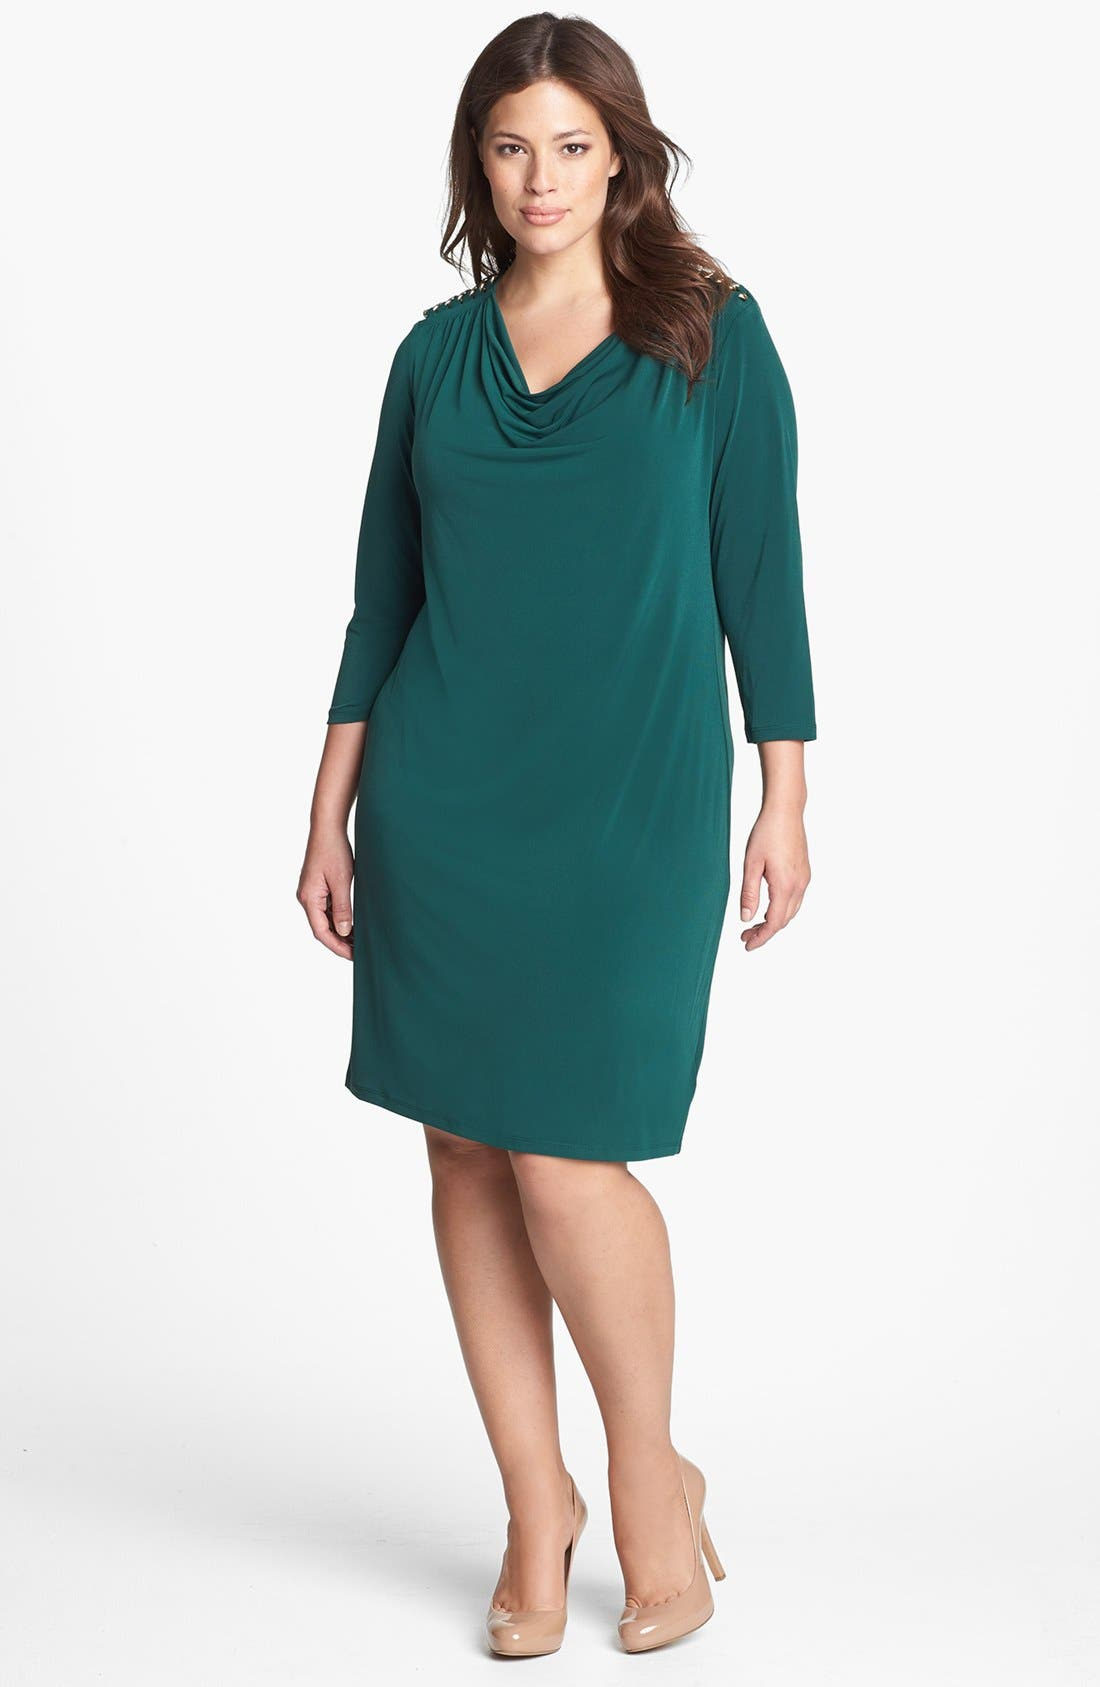 Alternate Image 1 Selected - MICHAEL Michael Kors Chain Embellished Draped Jersey Dress